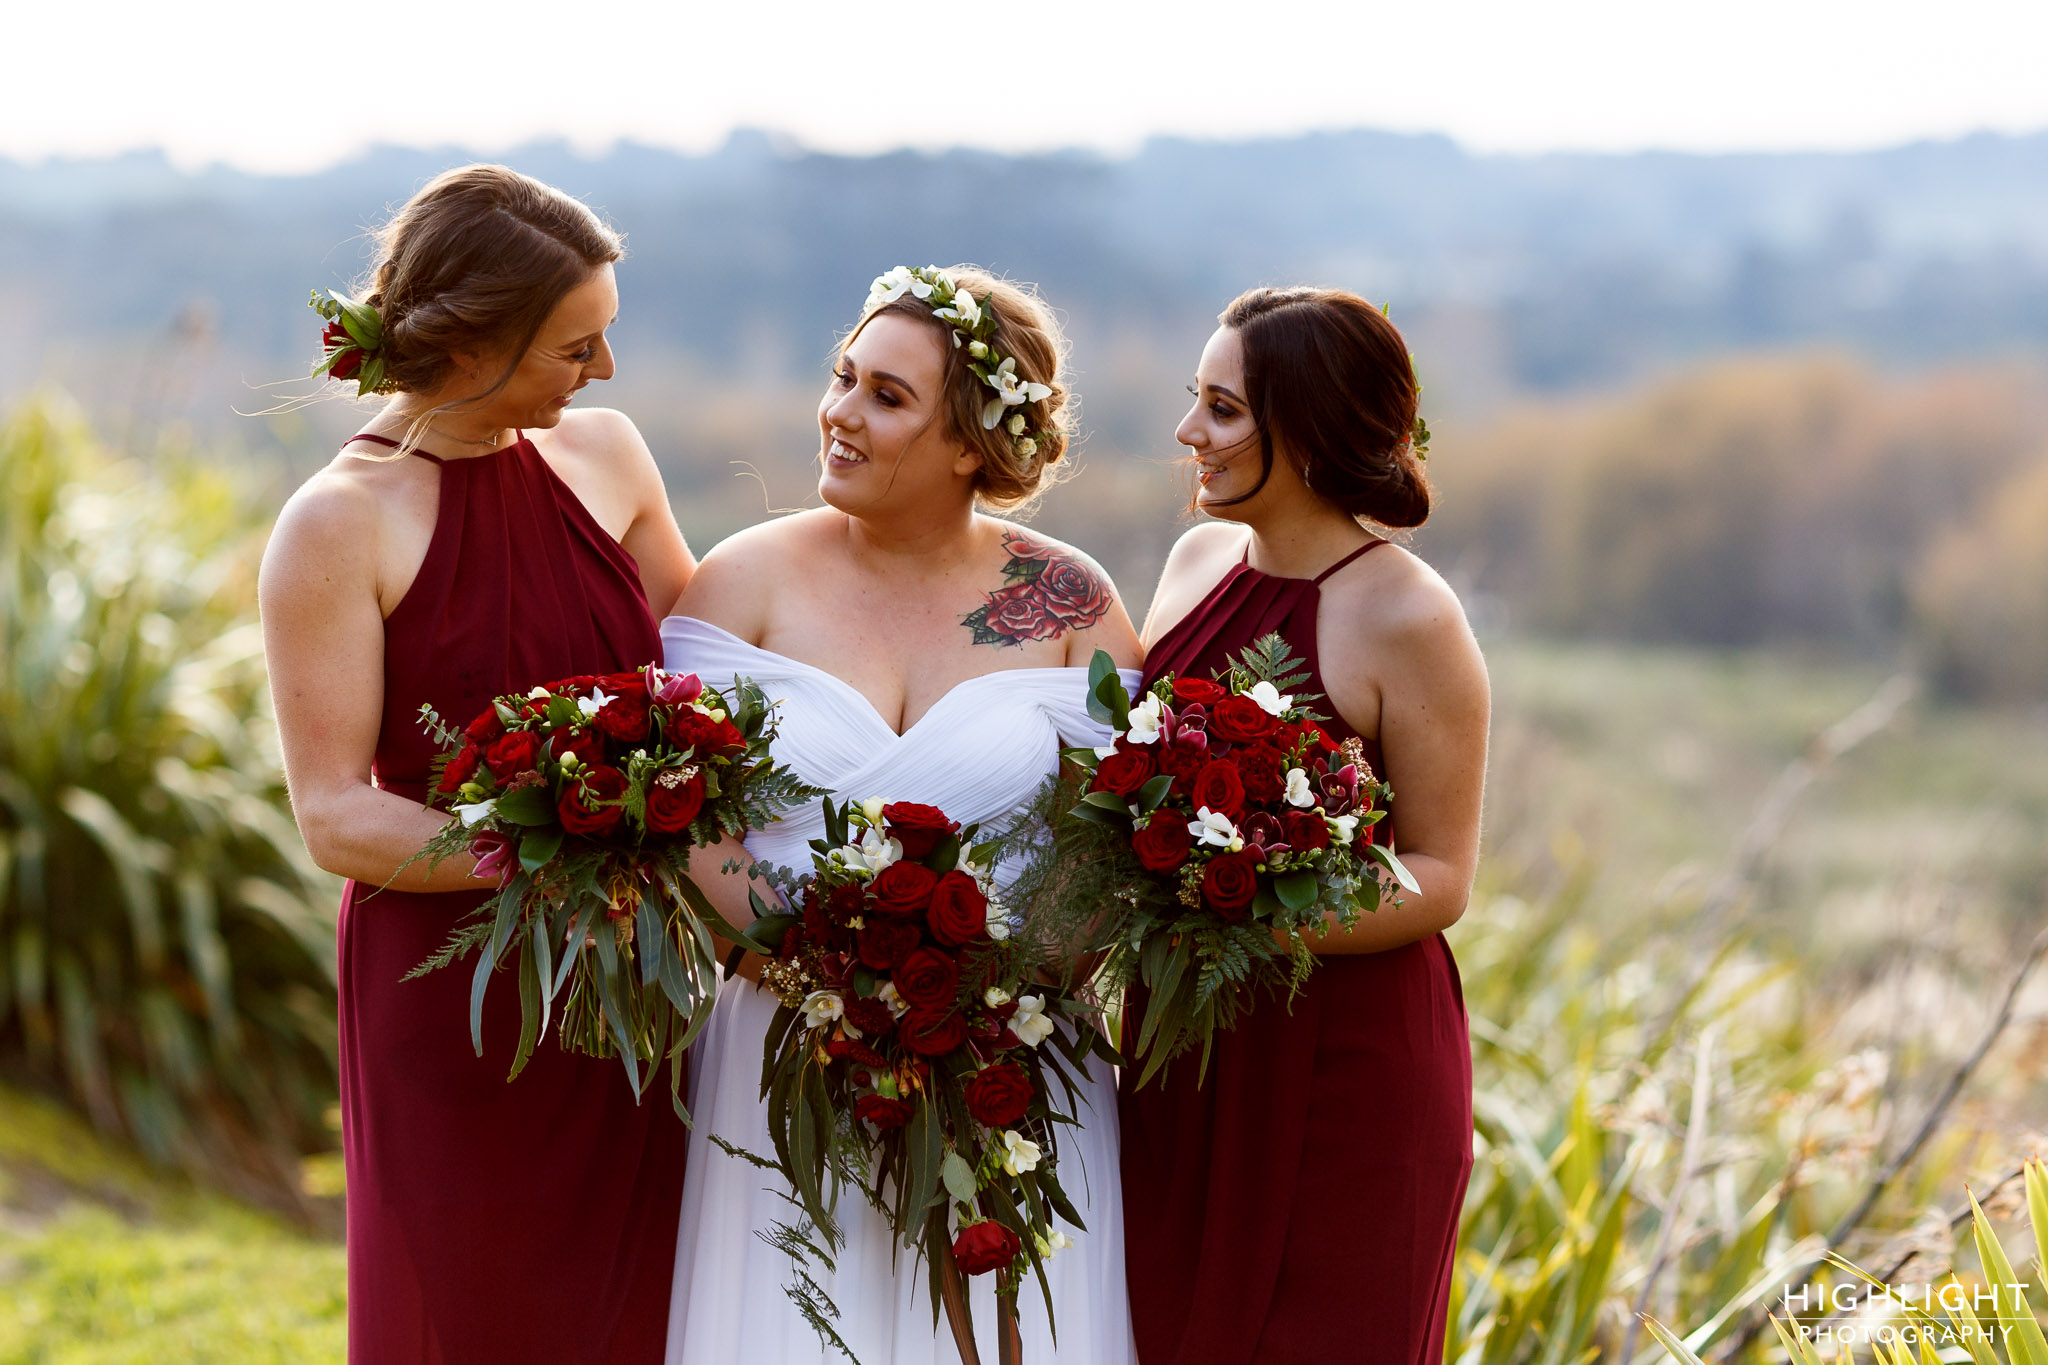 Highlight-wedding-photography-new-zealand-palmerston-north-83.jpg